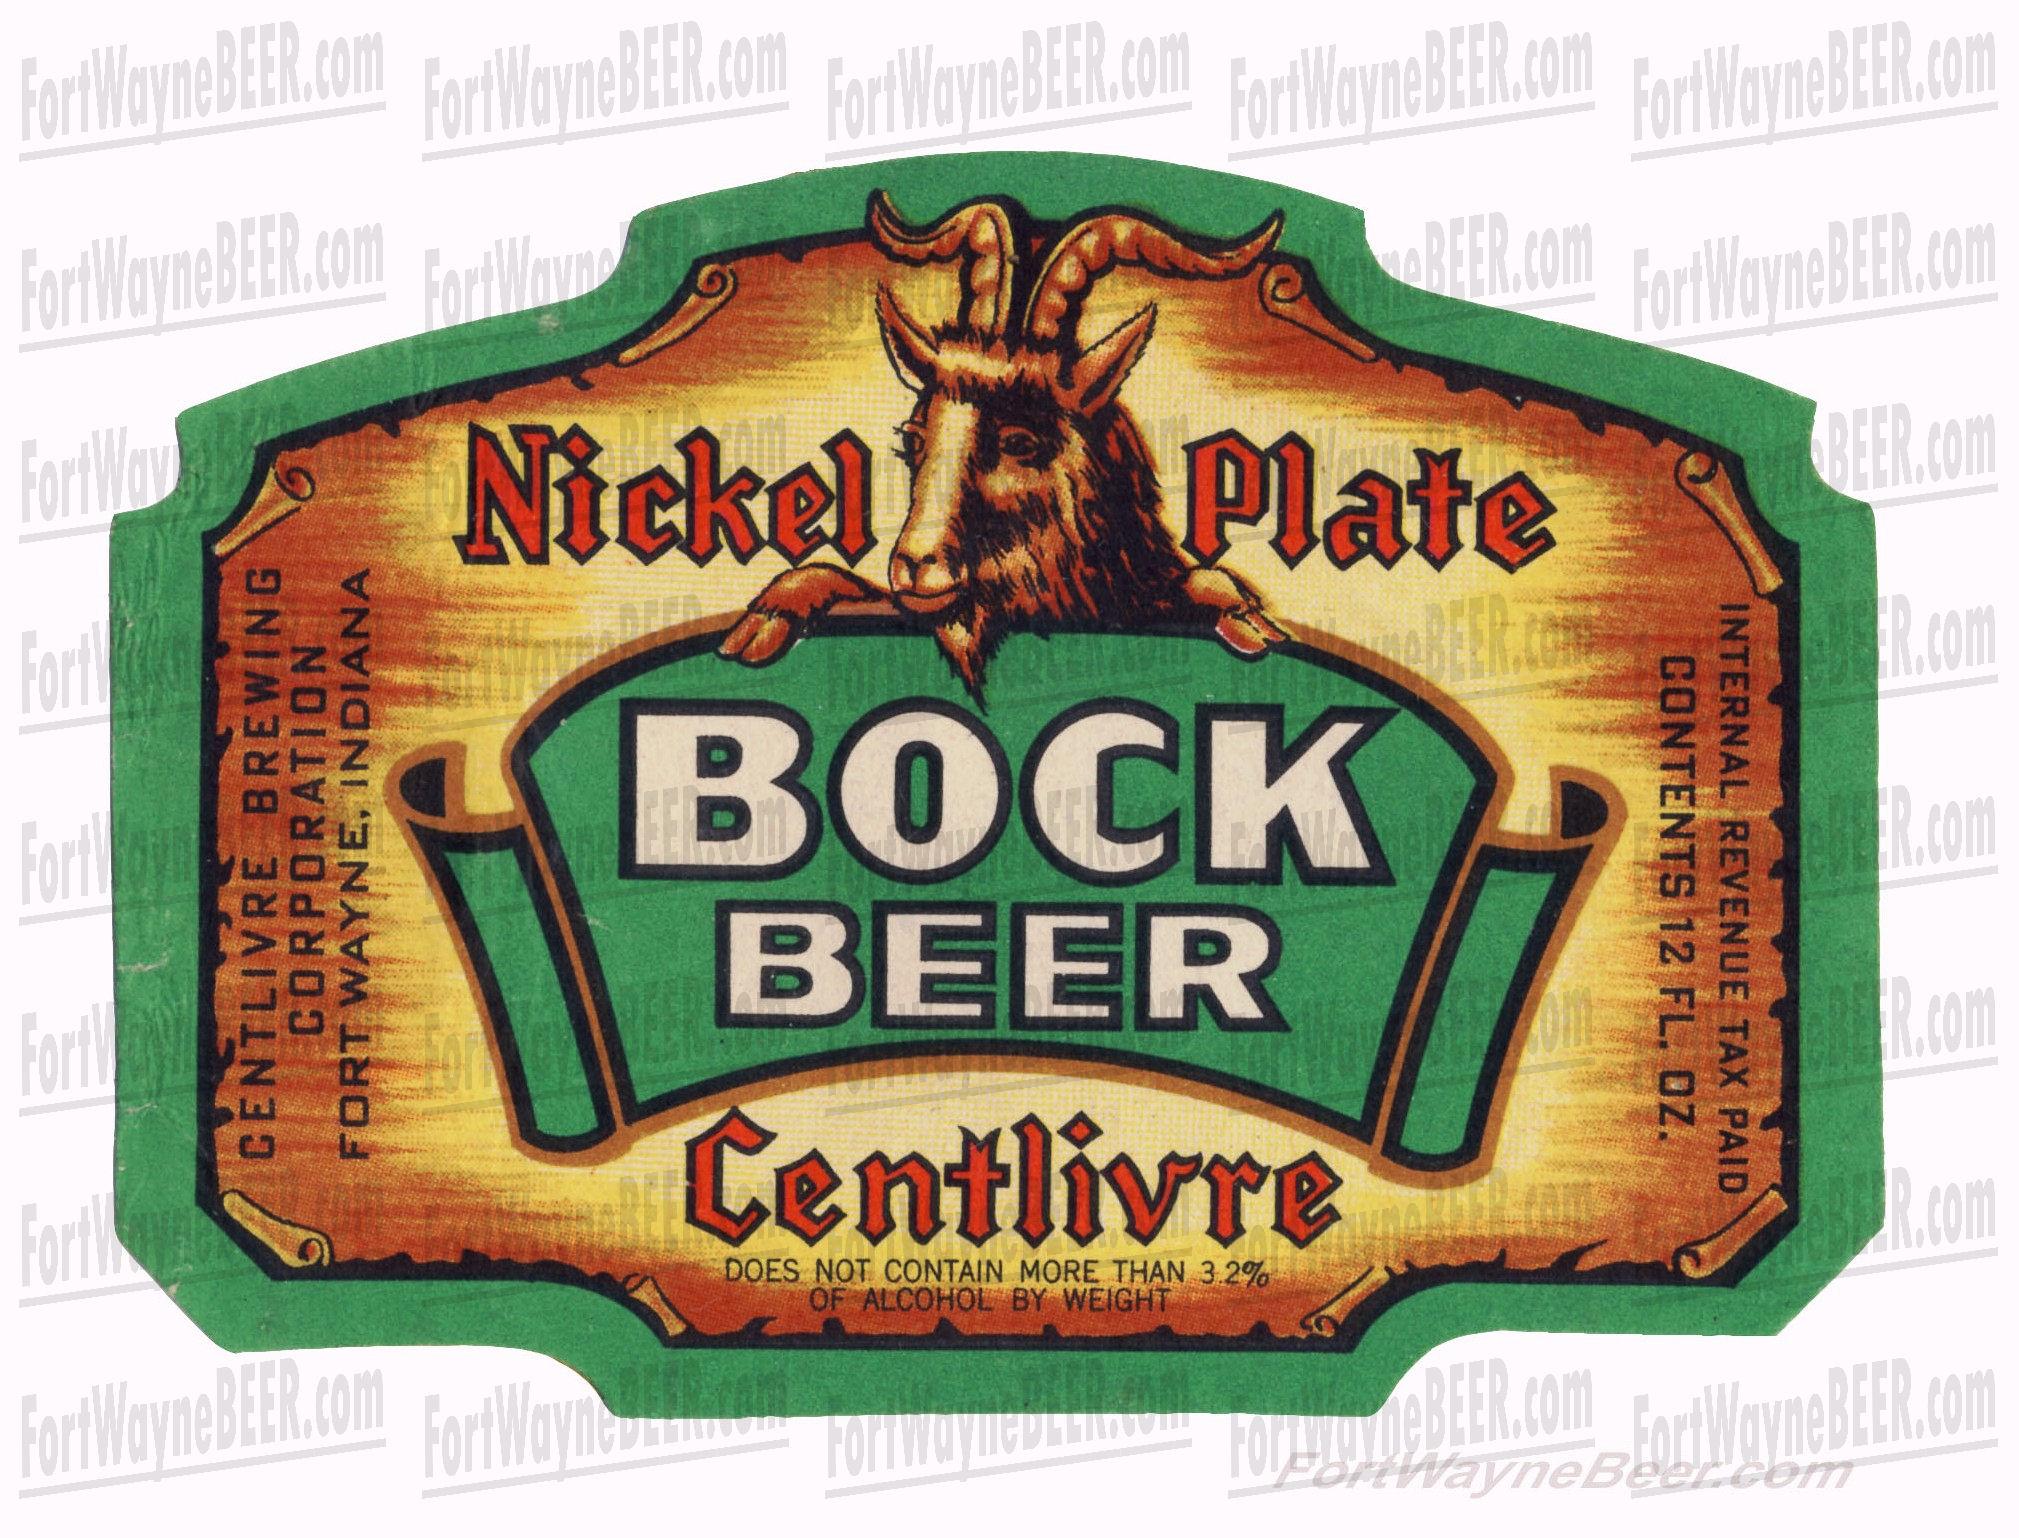 Centlivre Nickel Plate Bock 1 labels copy.jpg